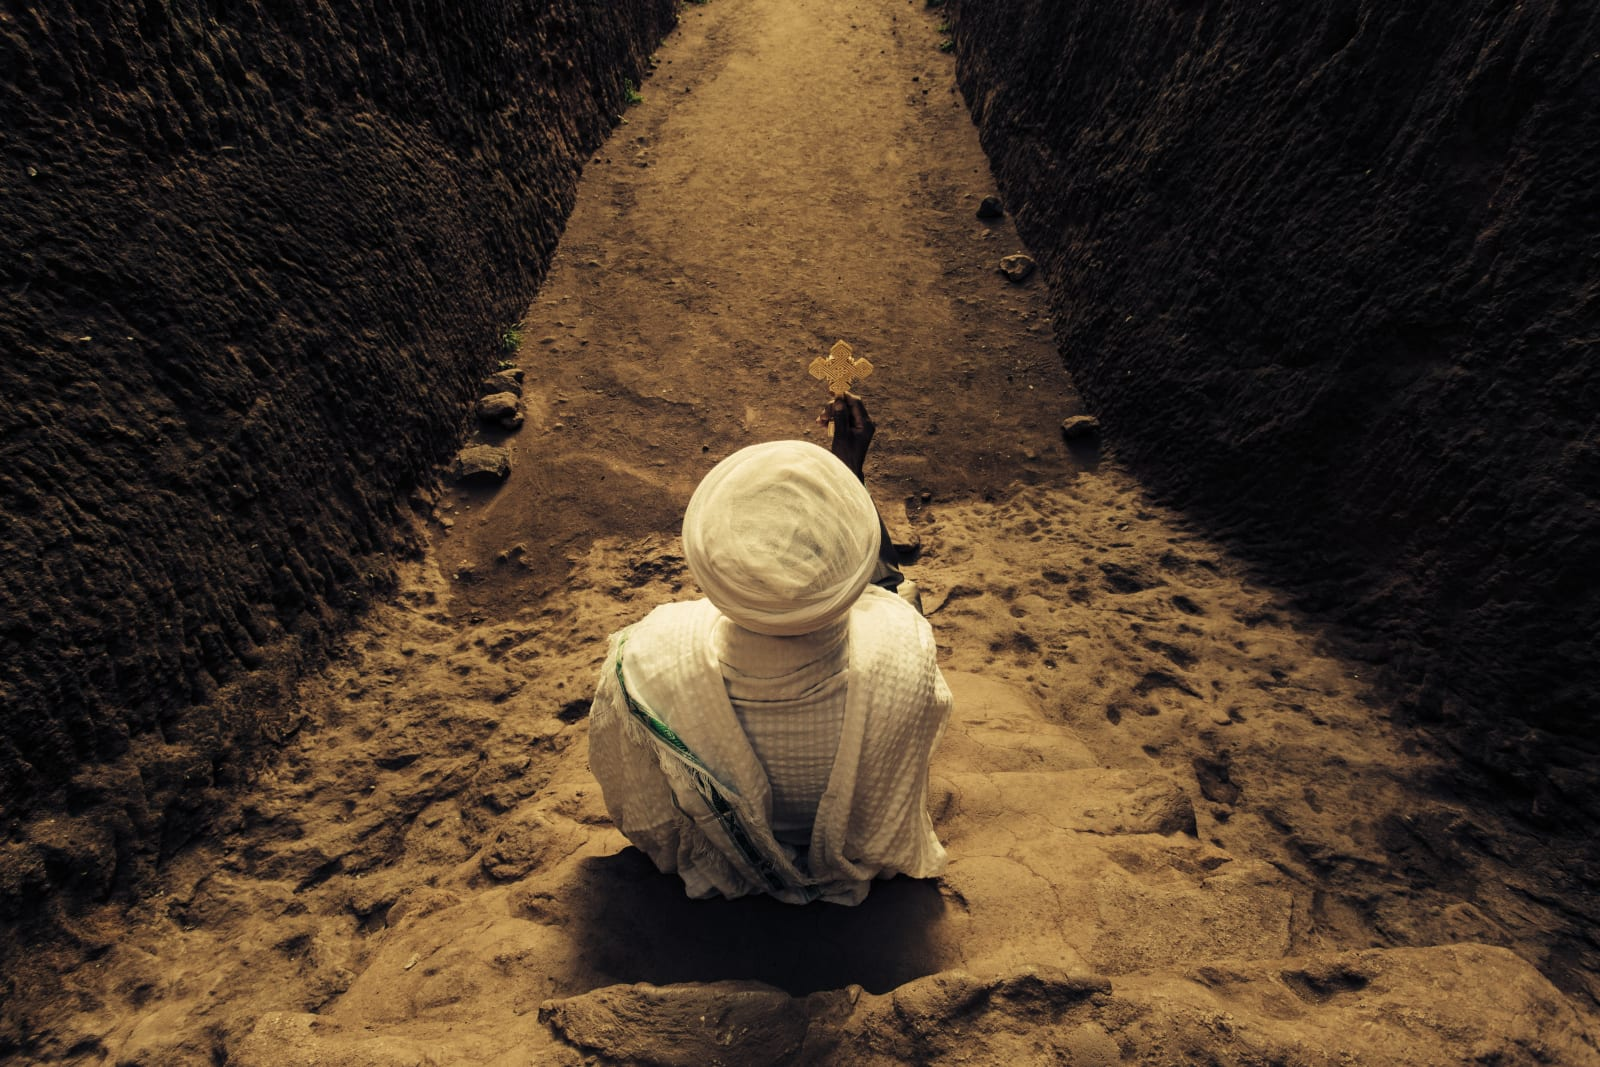 Abiy Solomon, Primordial Modernity: The Raw Spirit of Lalibela II, 2014